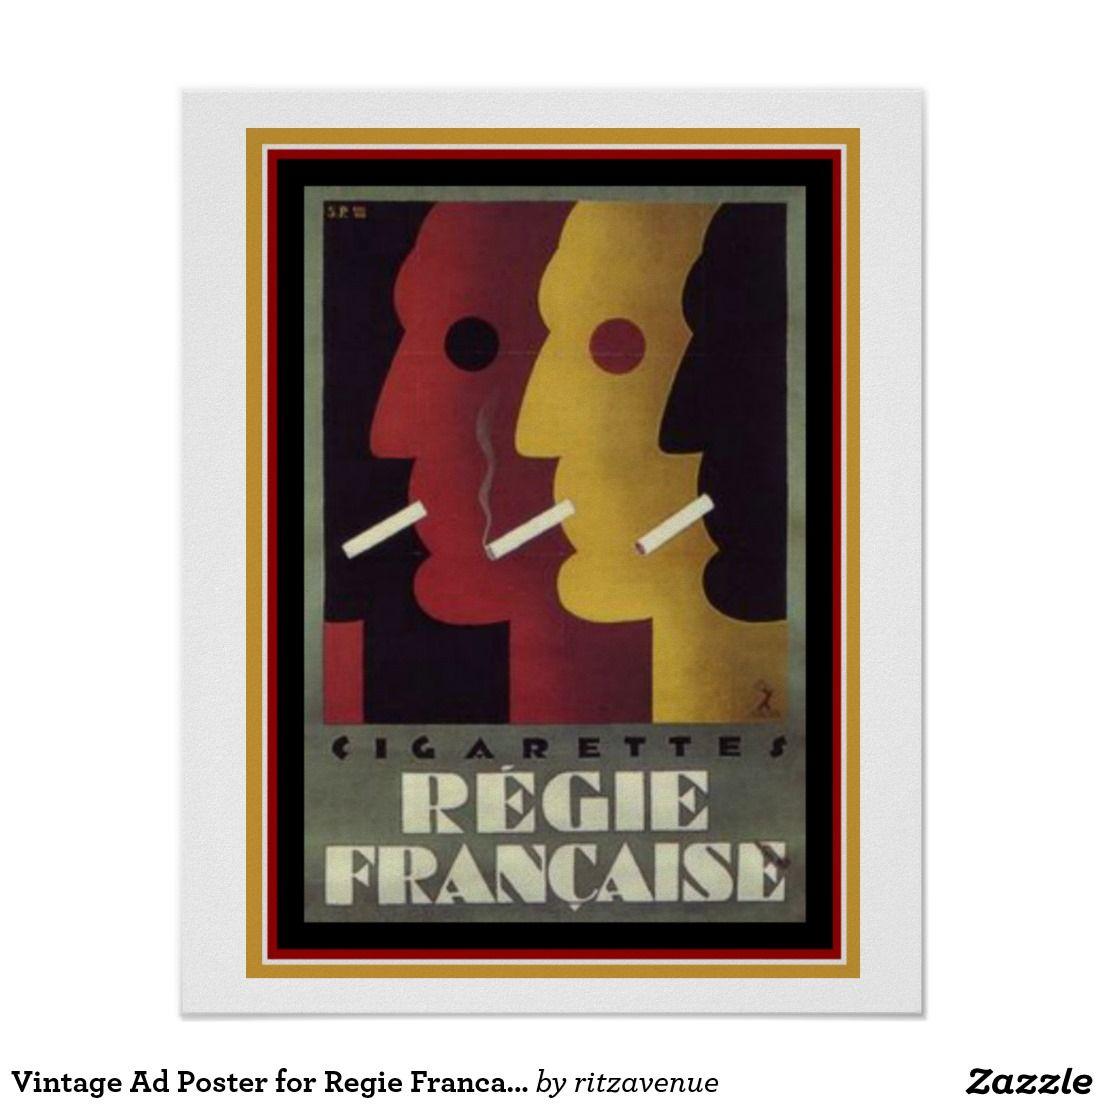 Vintage Ad Poster For Regie Francaise Cigarettes 1430